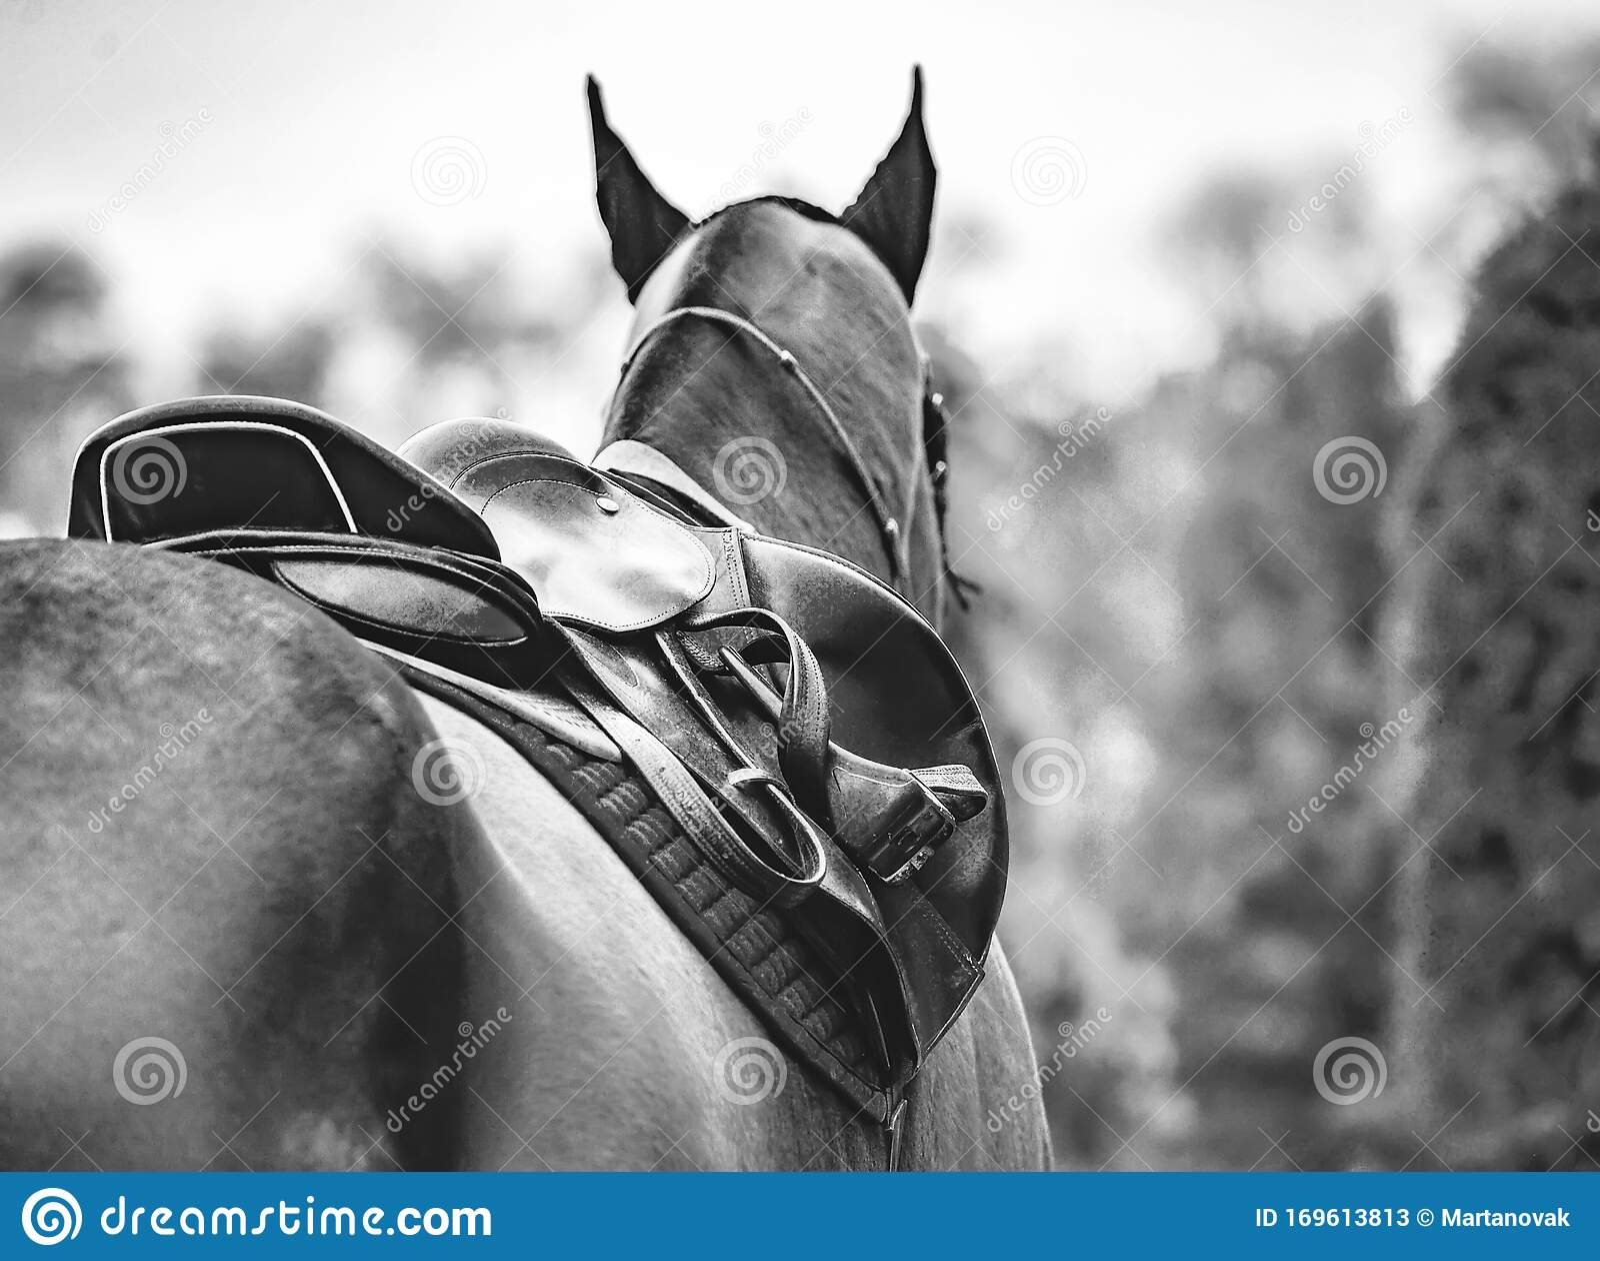 Black Horse Leather Saddle Stock Image Image Of Competition 169613813